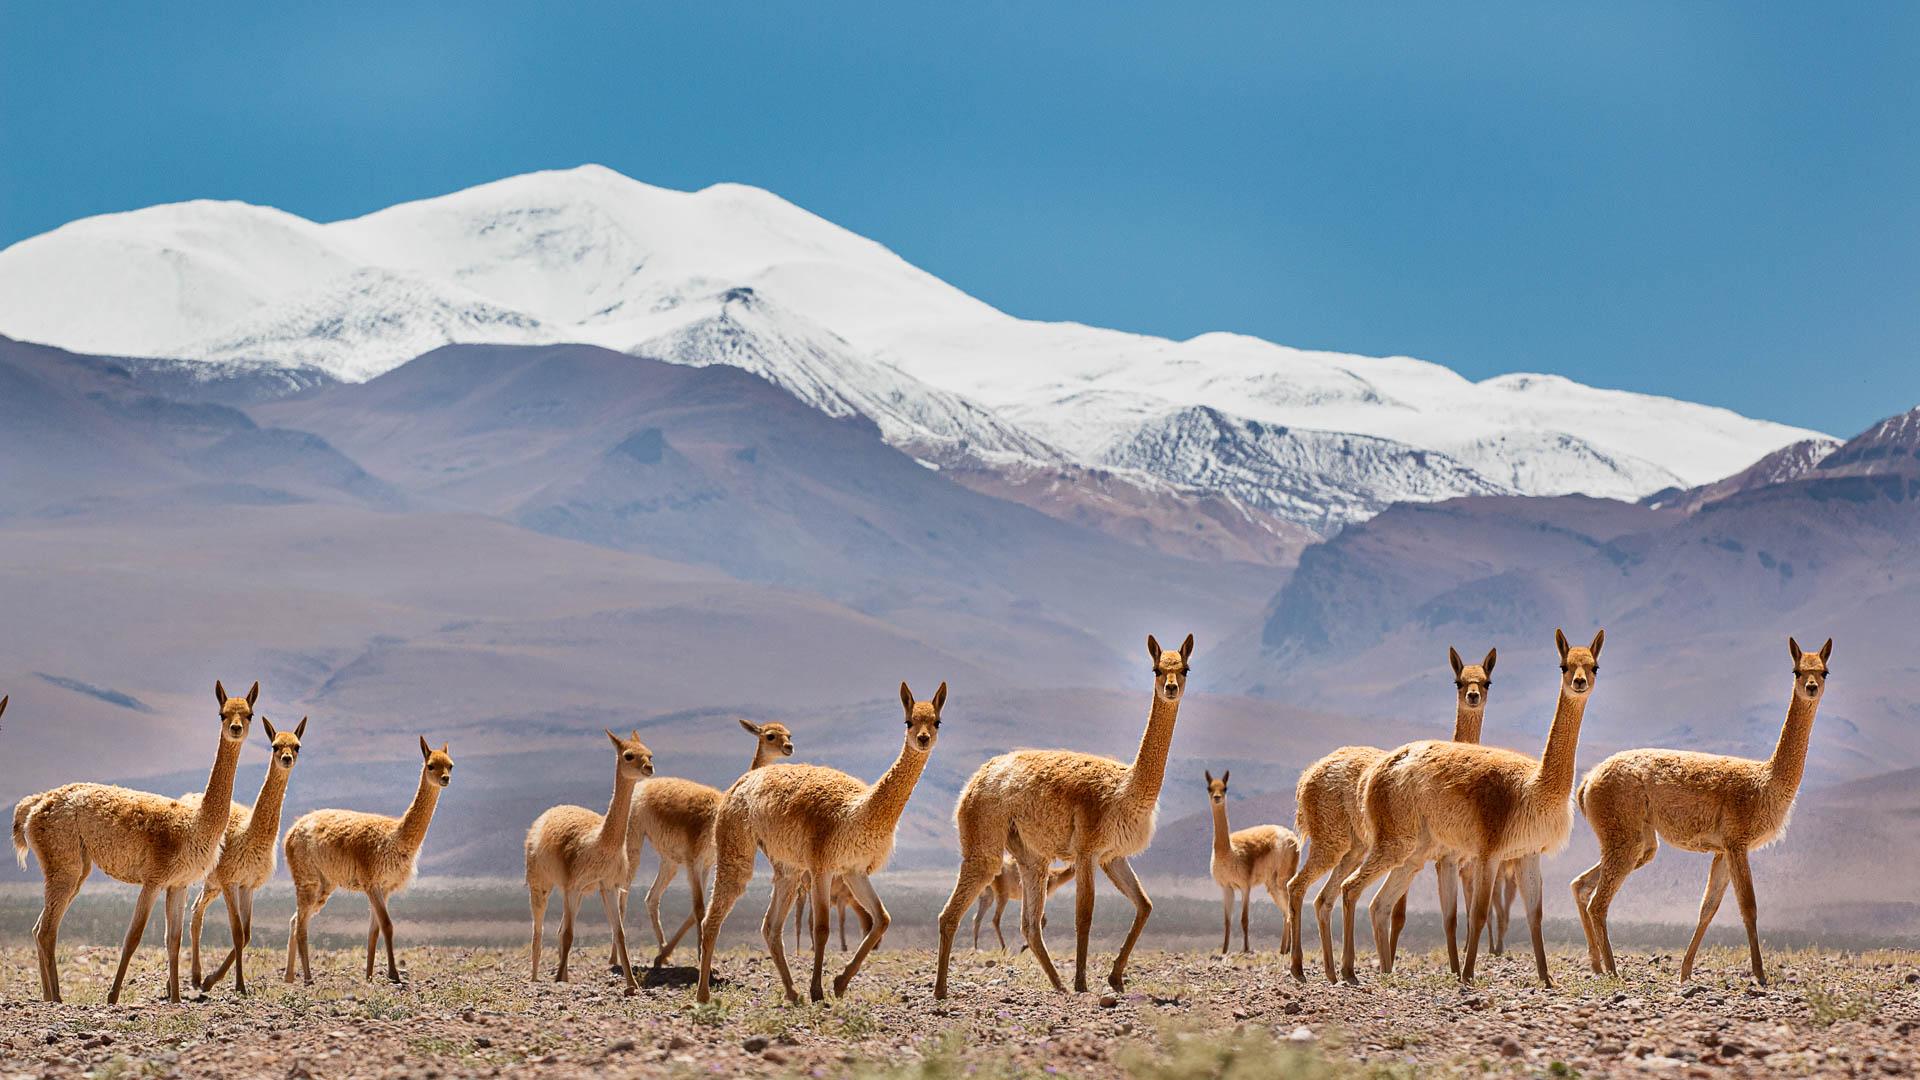 Un grupo de vicuñas posa con el Nevado de Quehuar como telón de fondo.